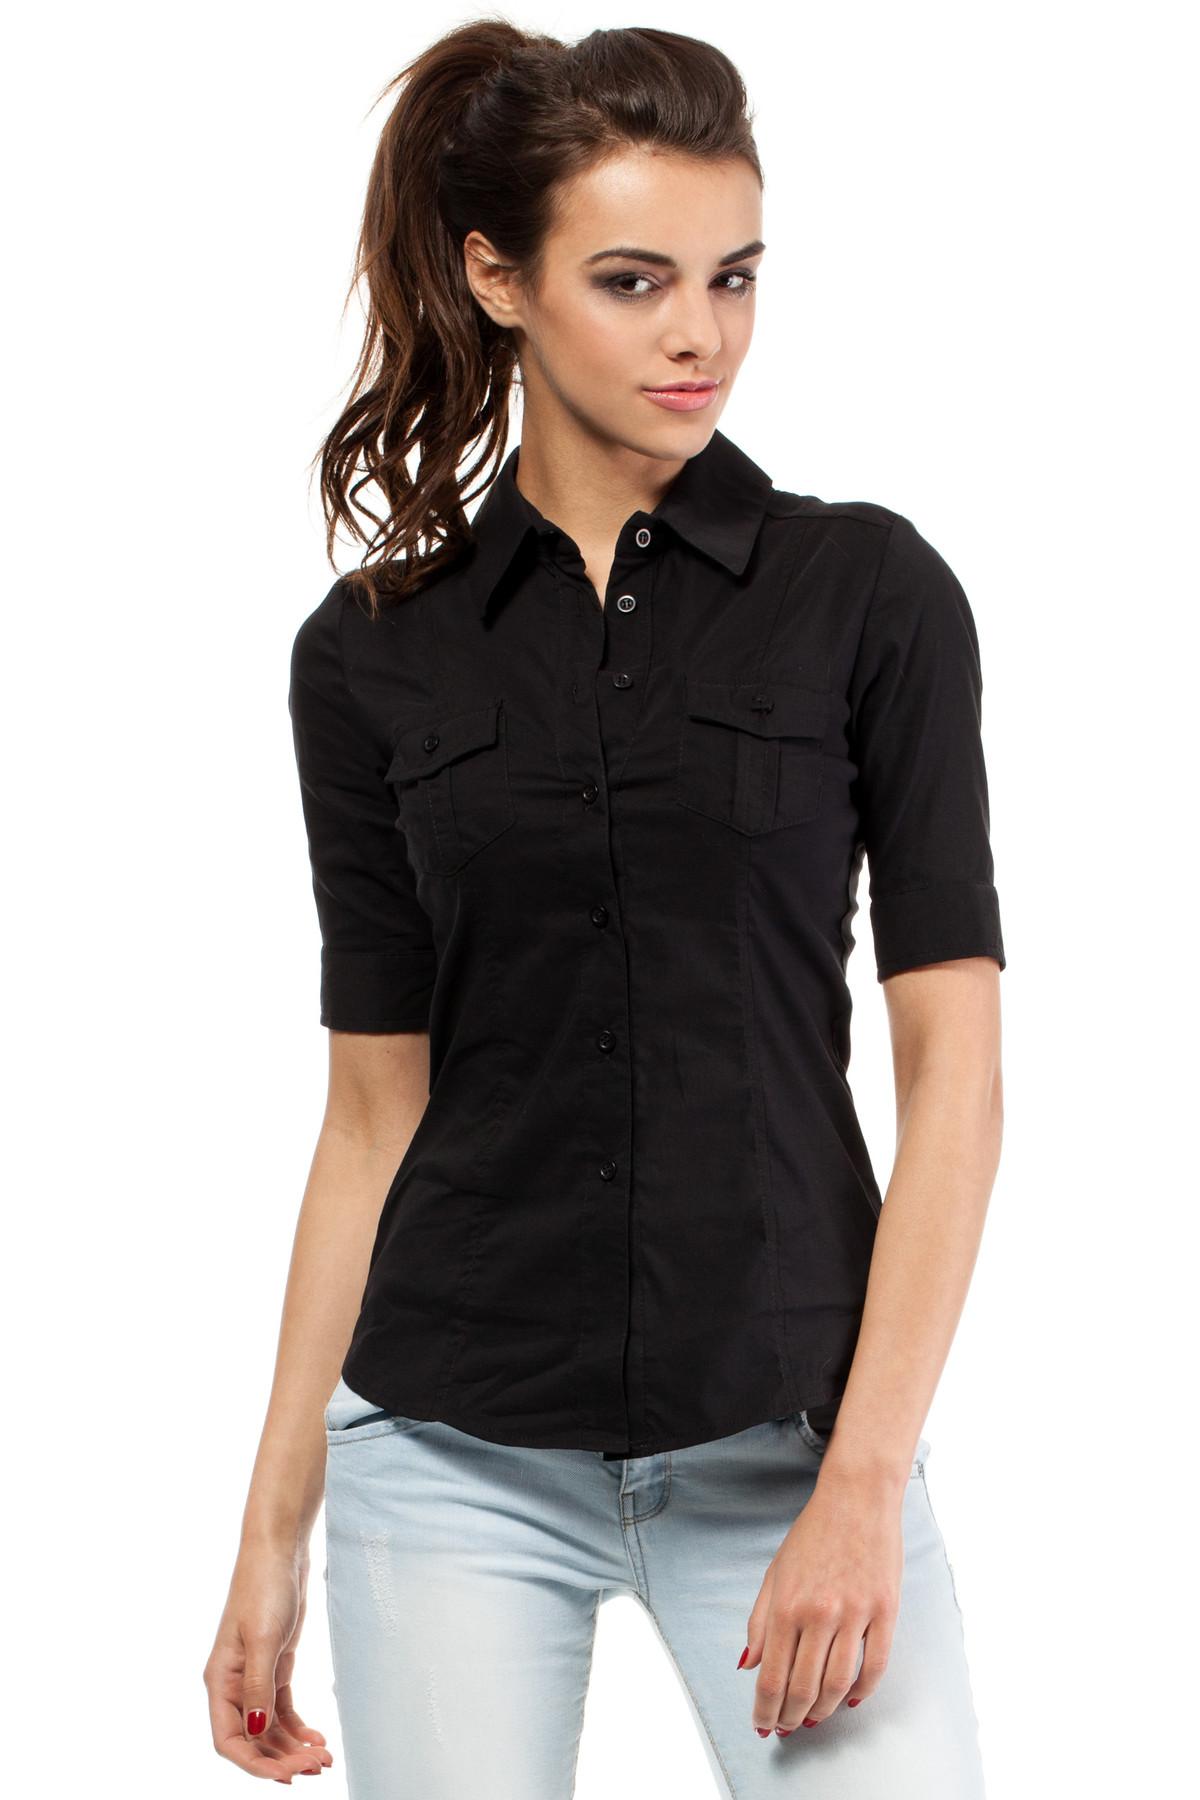 clea klassisches gestreiftes kariertes hemd elegantes hemd kurze rmeln kragen damen blusen. Black Bedroom Furniture Sets. Home Design Ideas